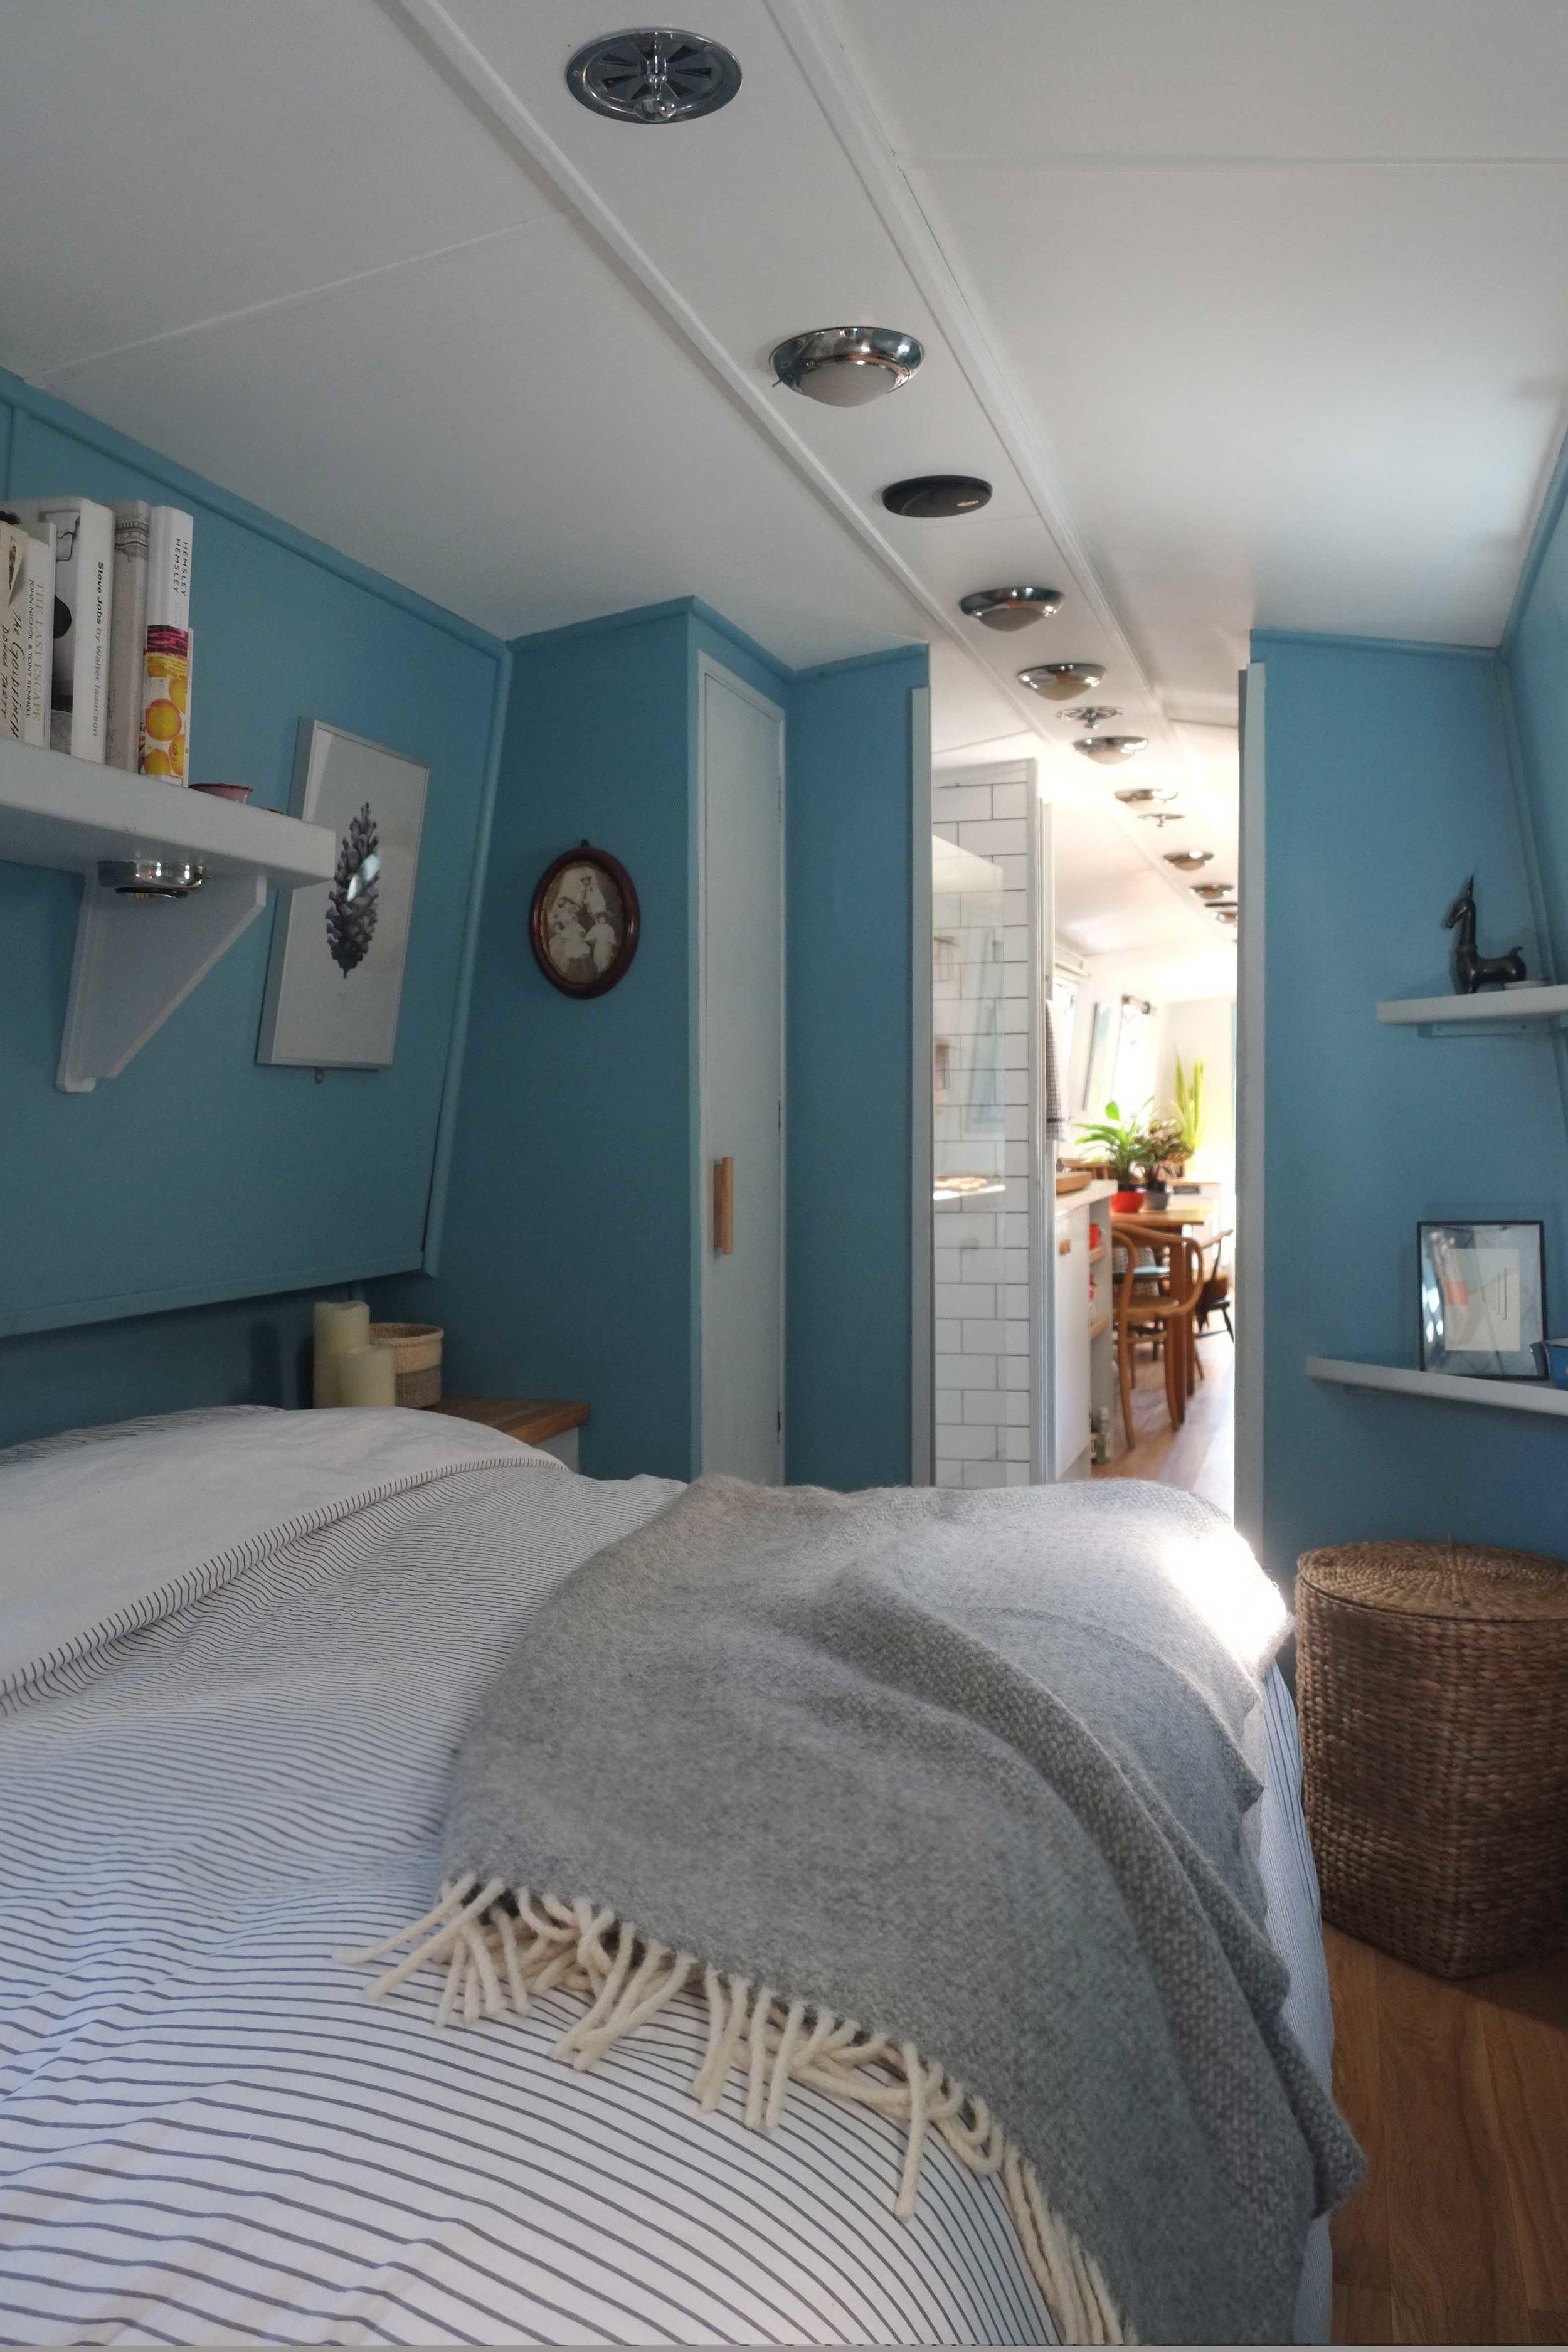 lunarlunar_interior_design_canal_boat_small_space_bedroom.jpg